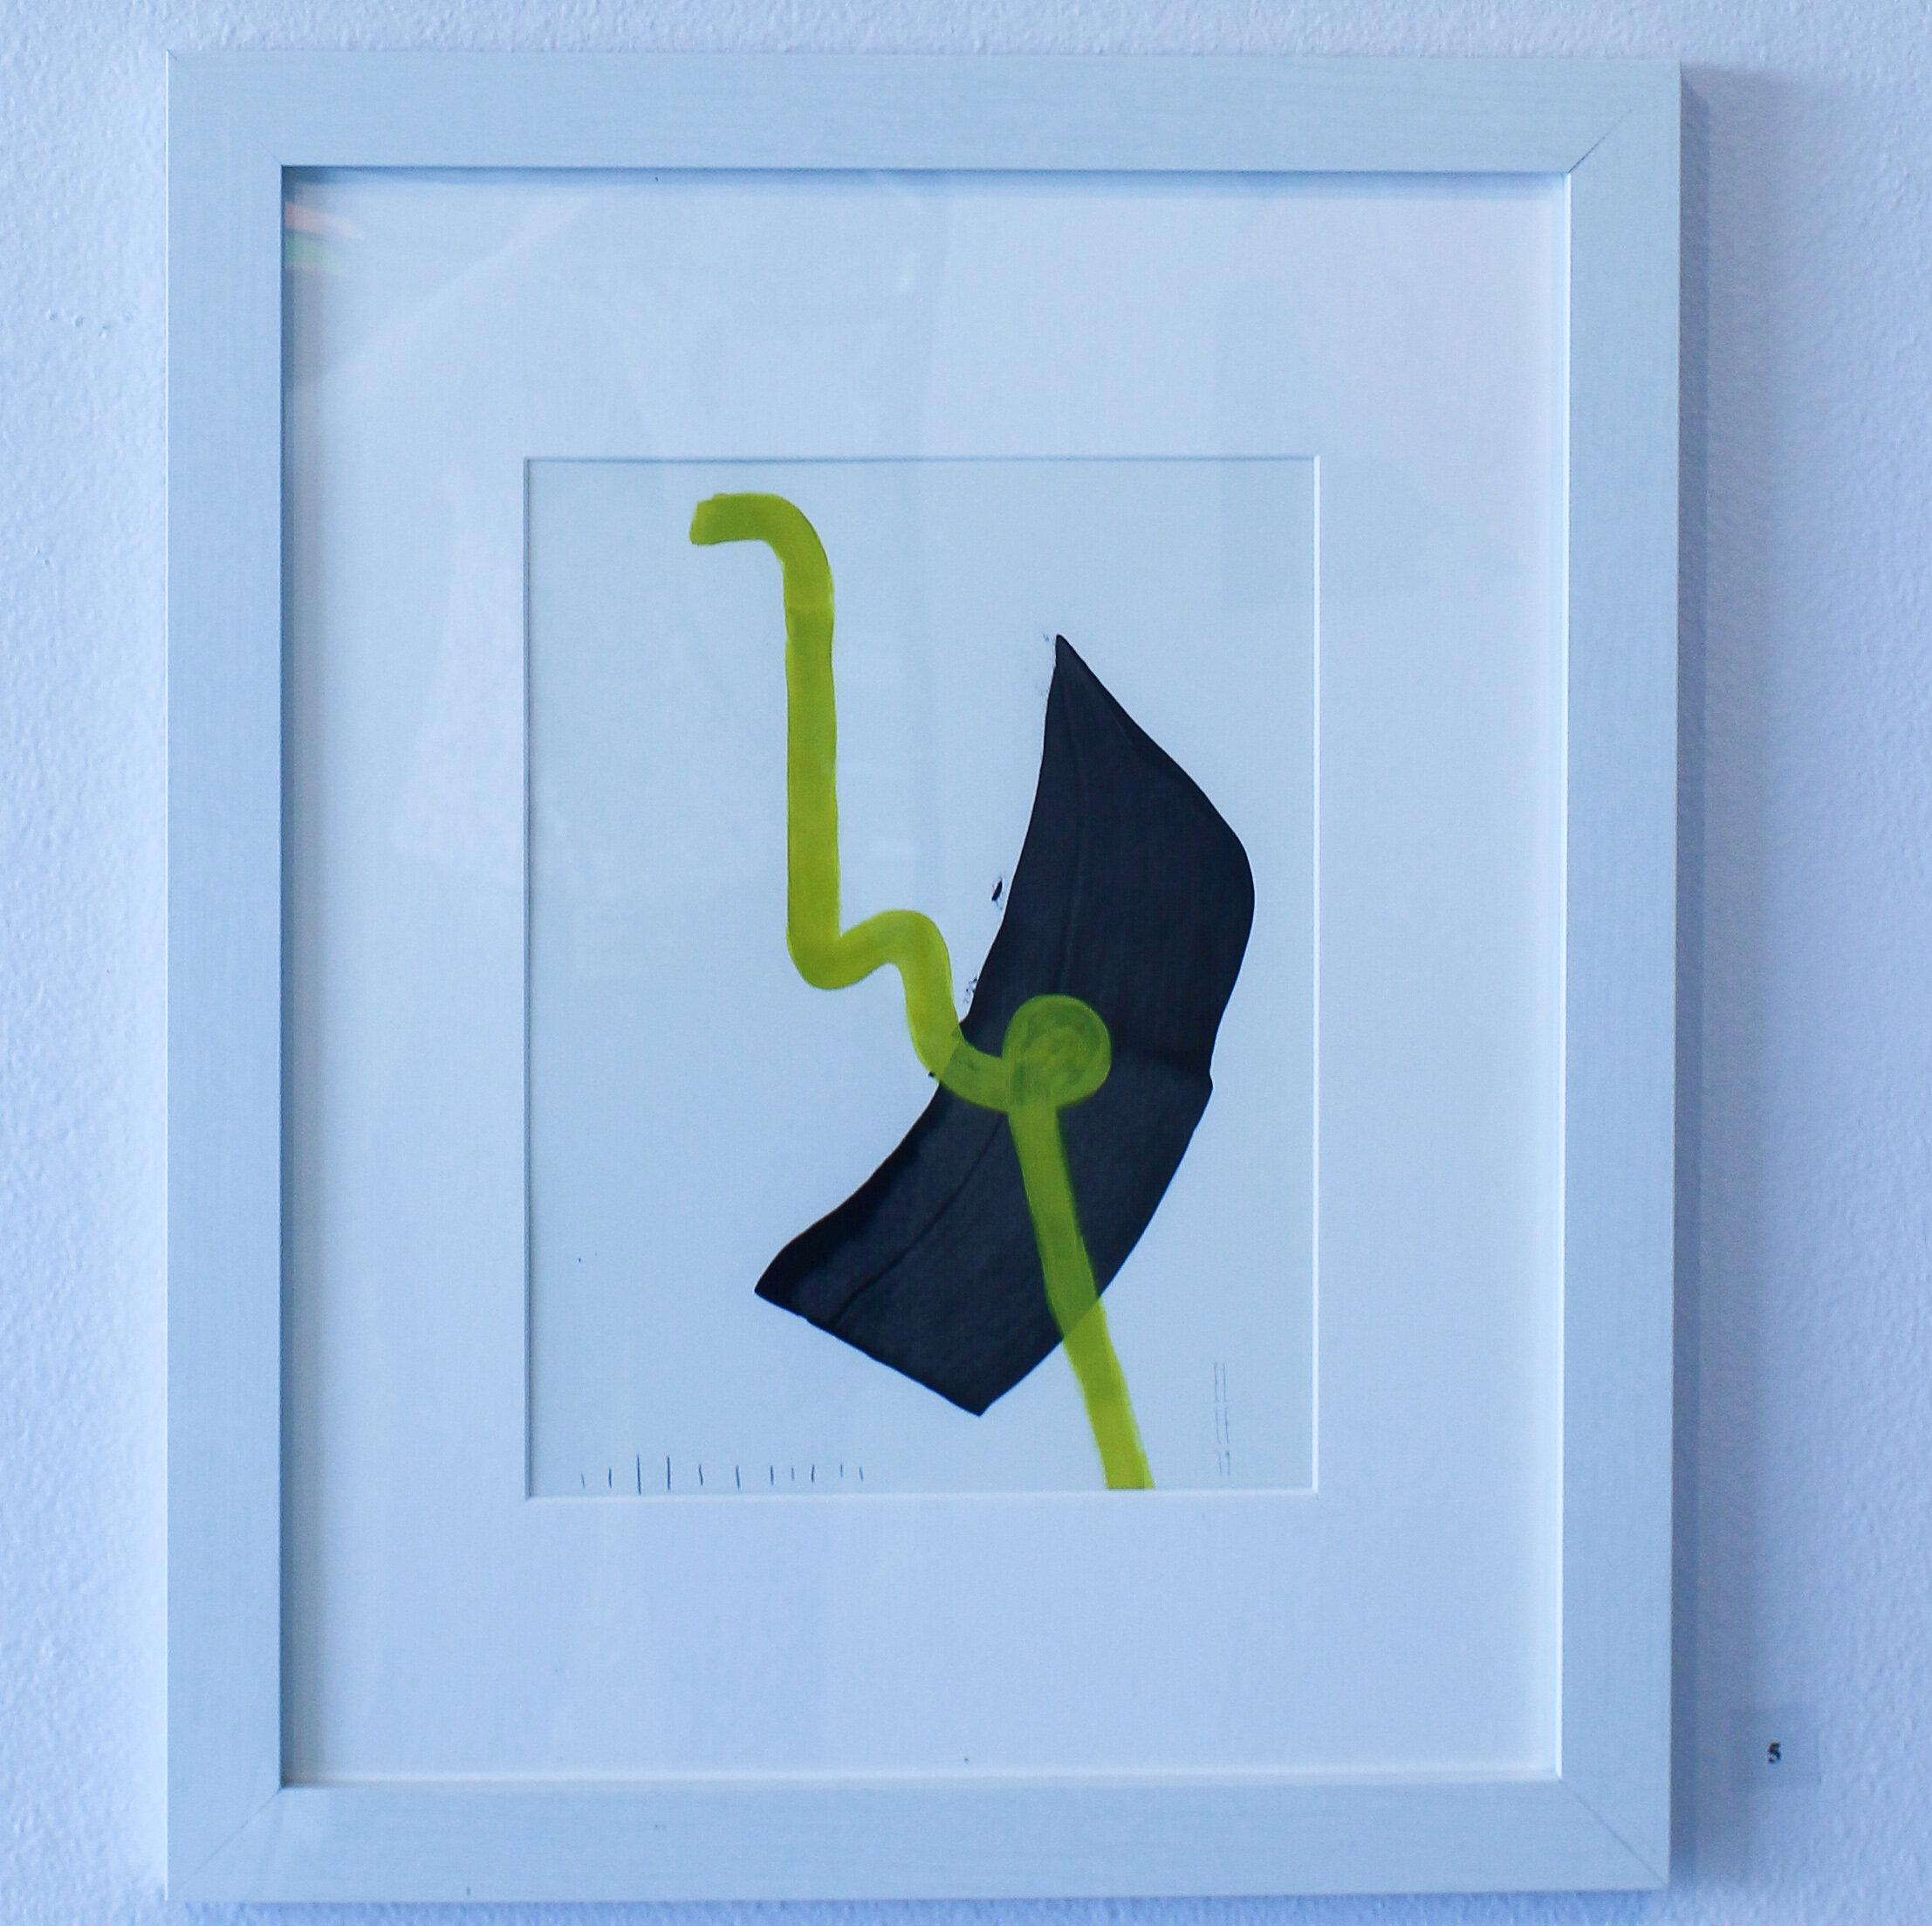 5. Chartreuse I by EL.jpg